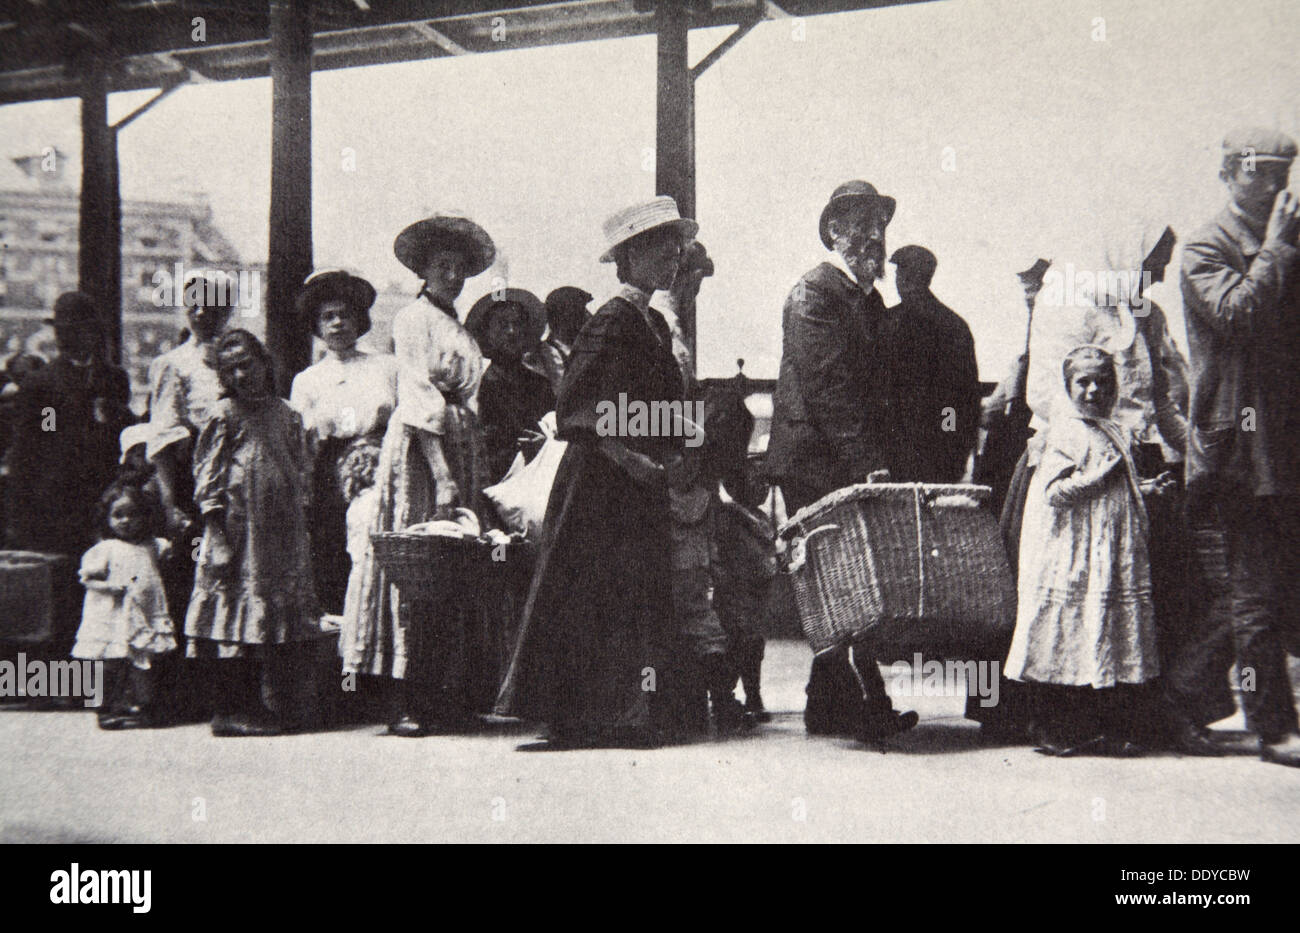 Immigrants Arriving At Ellis Island New York City Usa